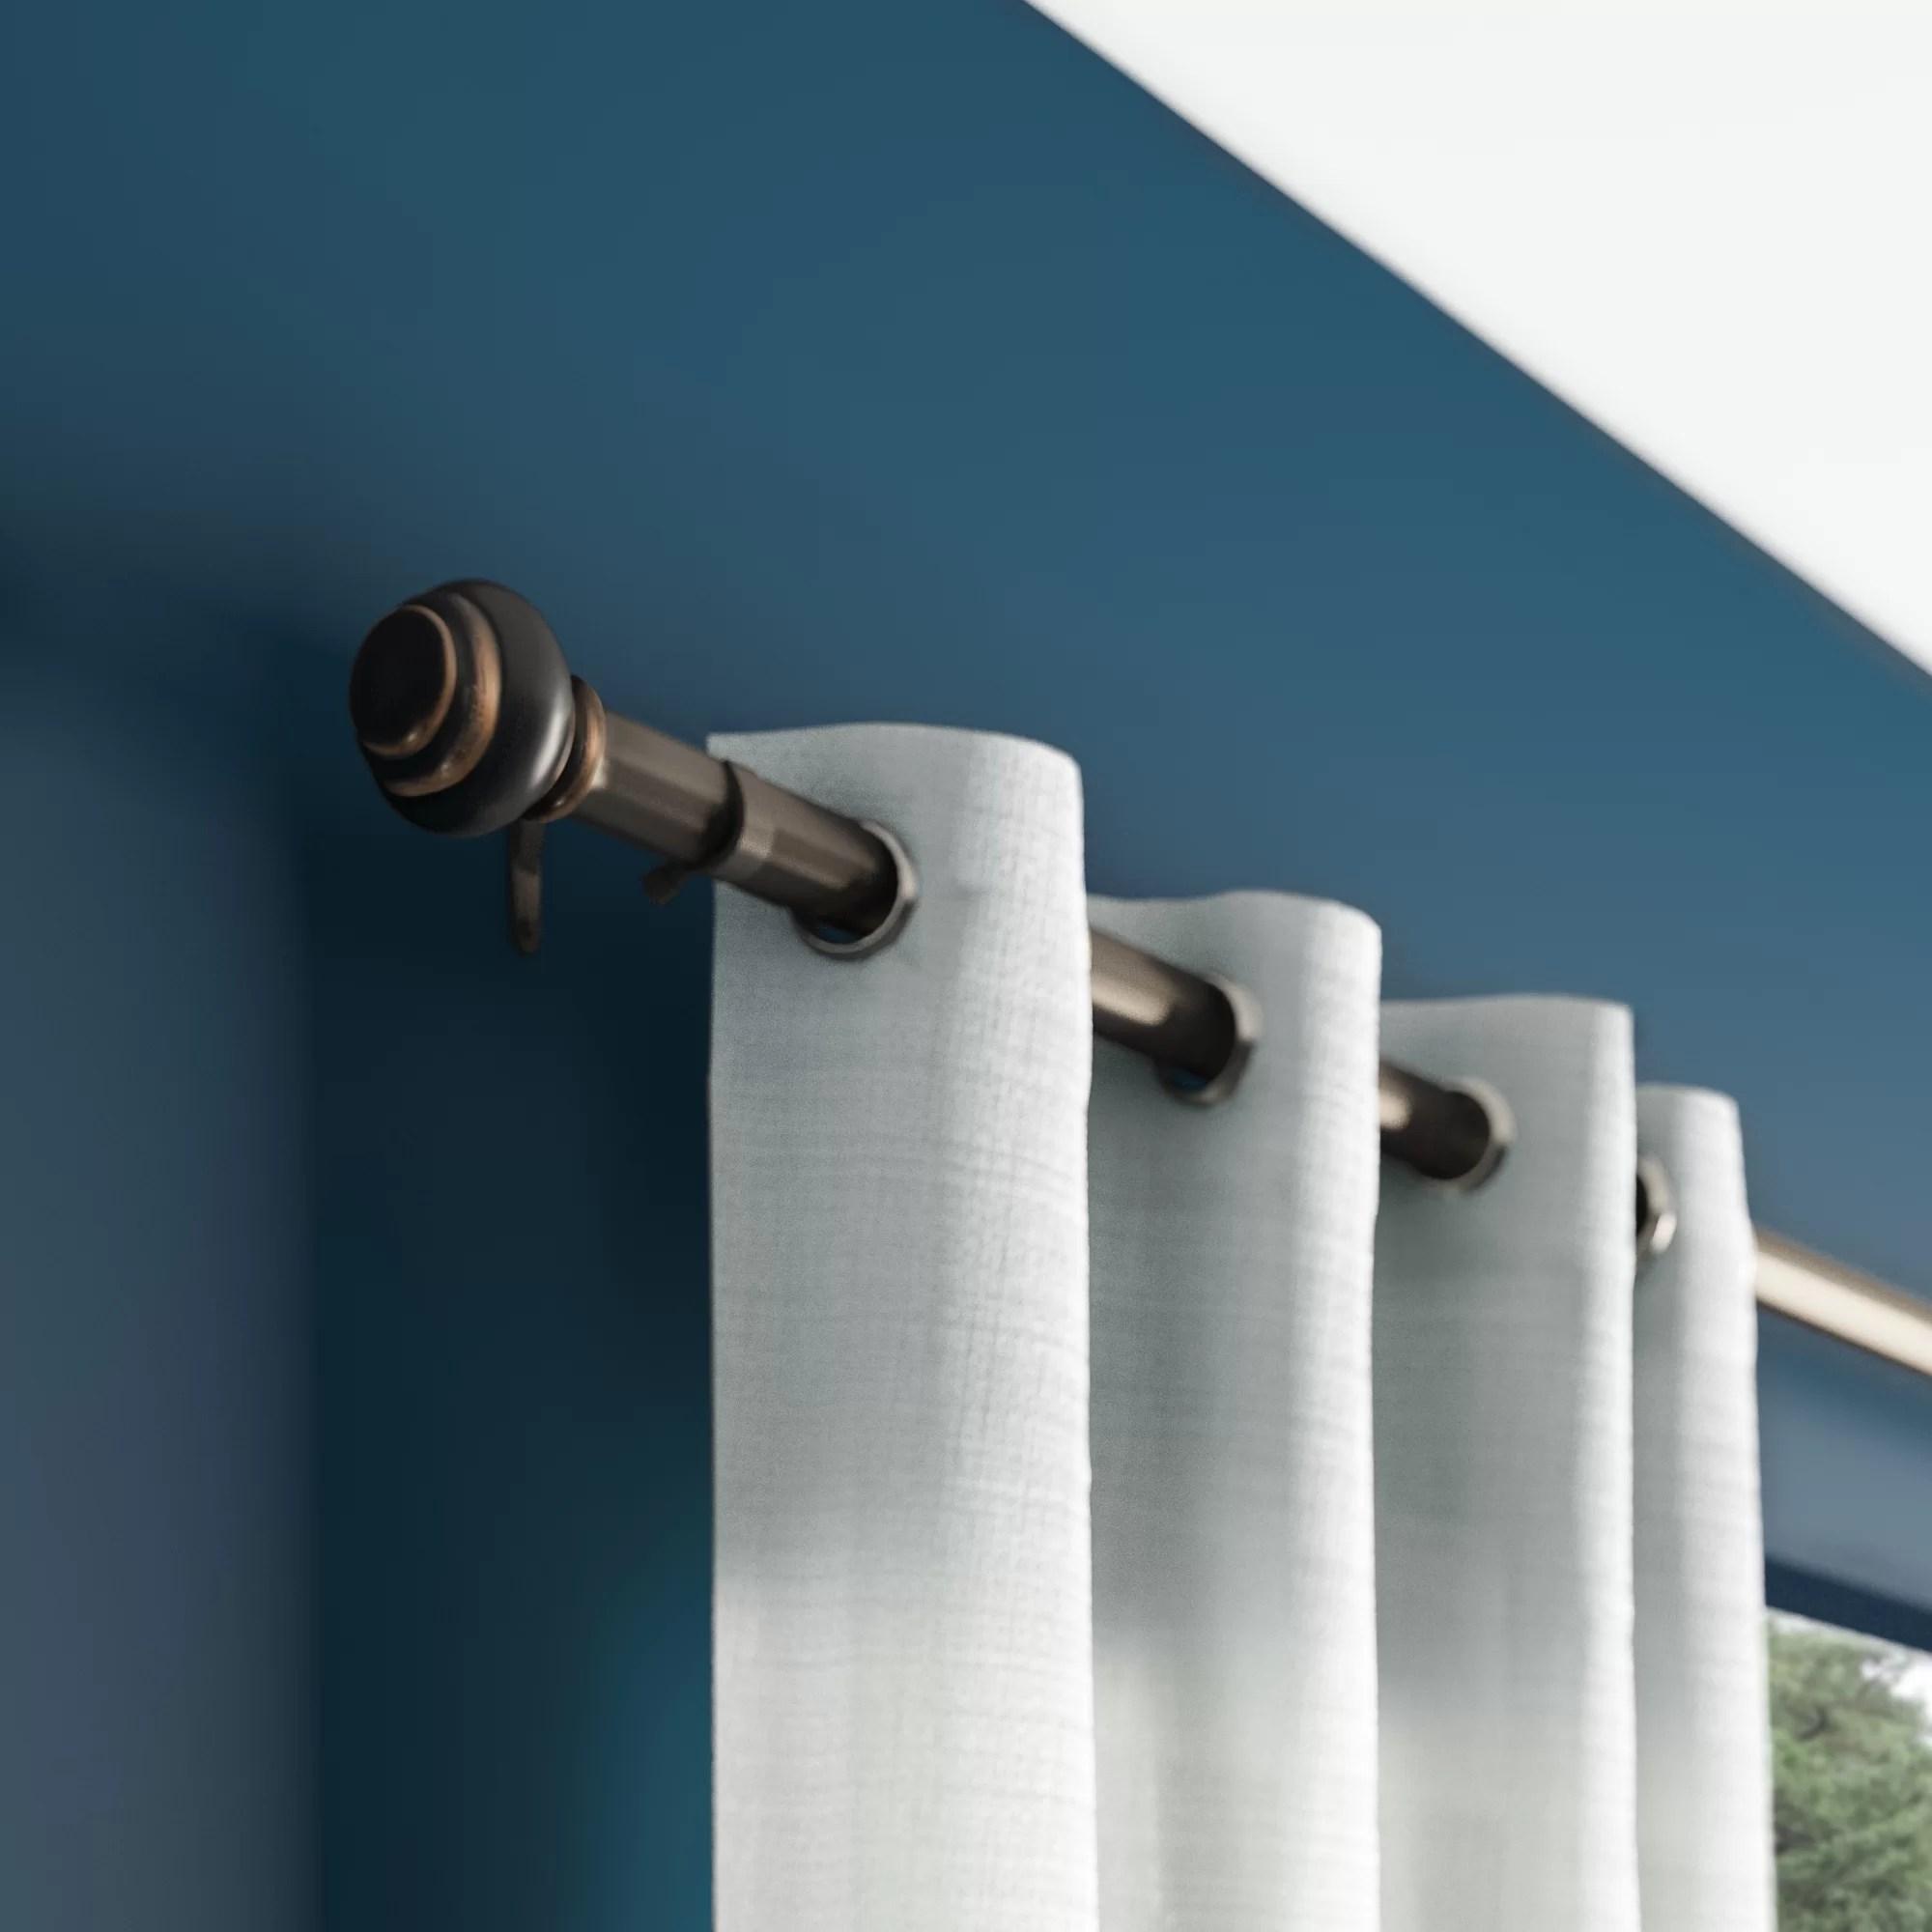 2 inch diameter rod curtain hardware